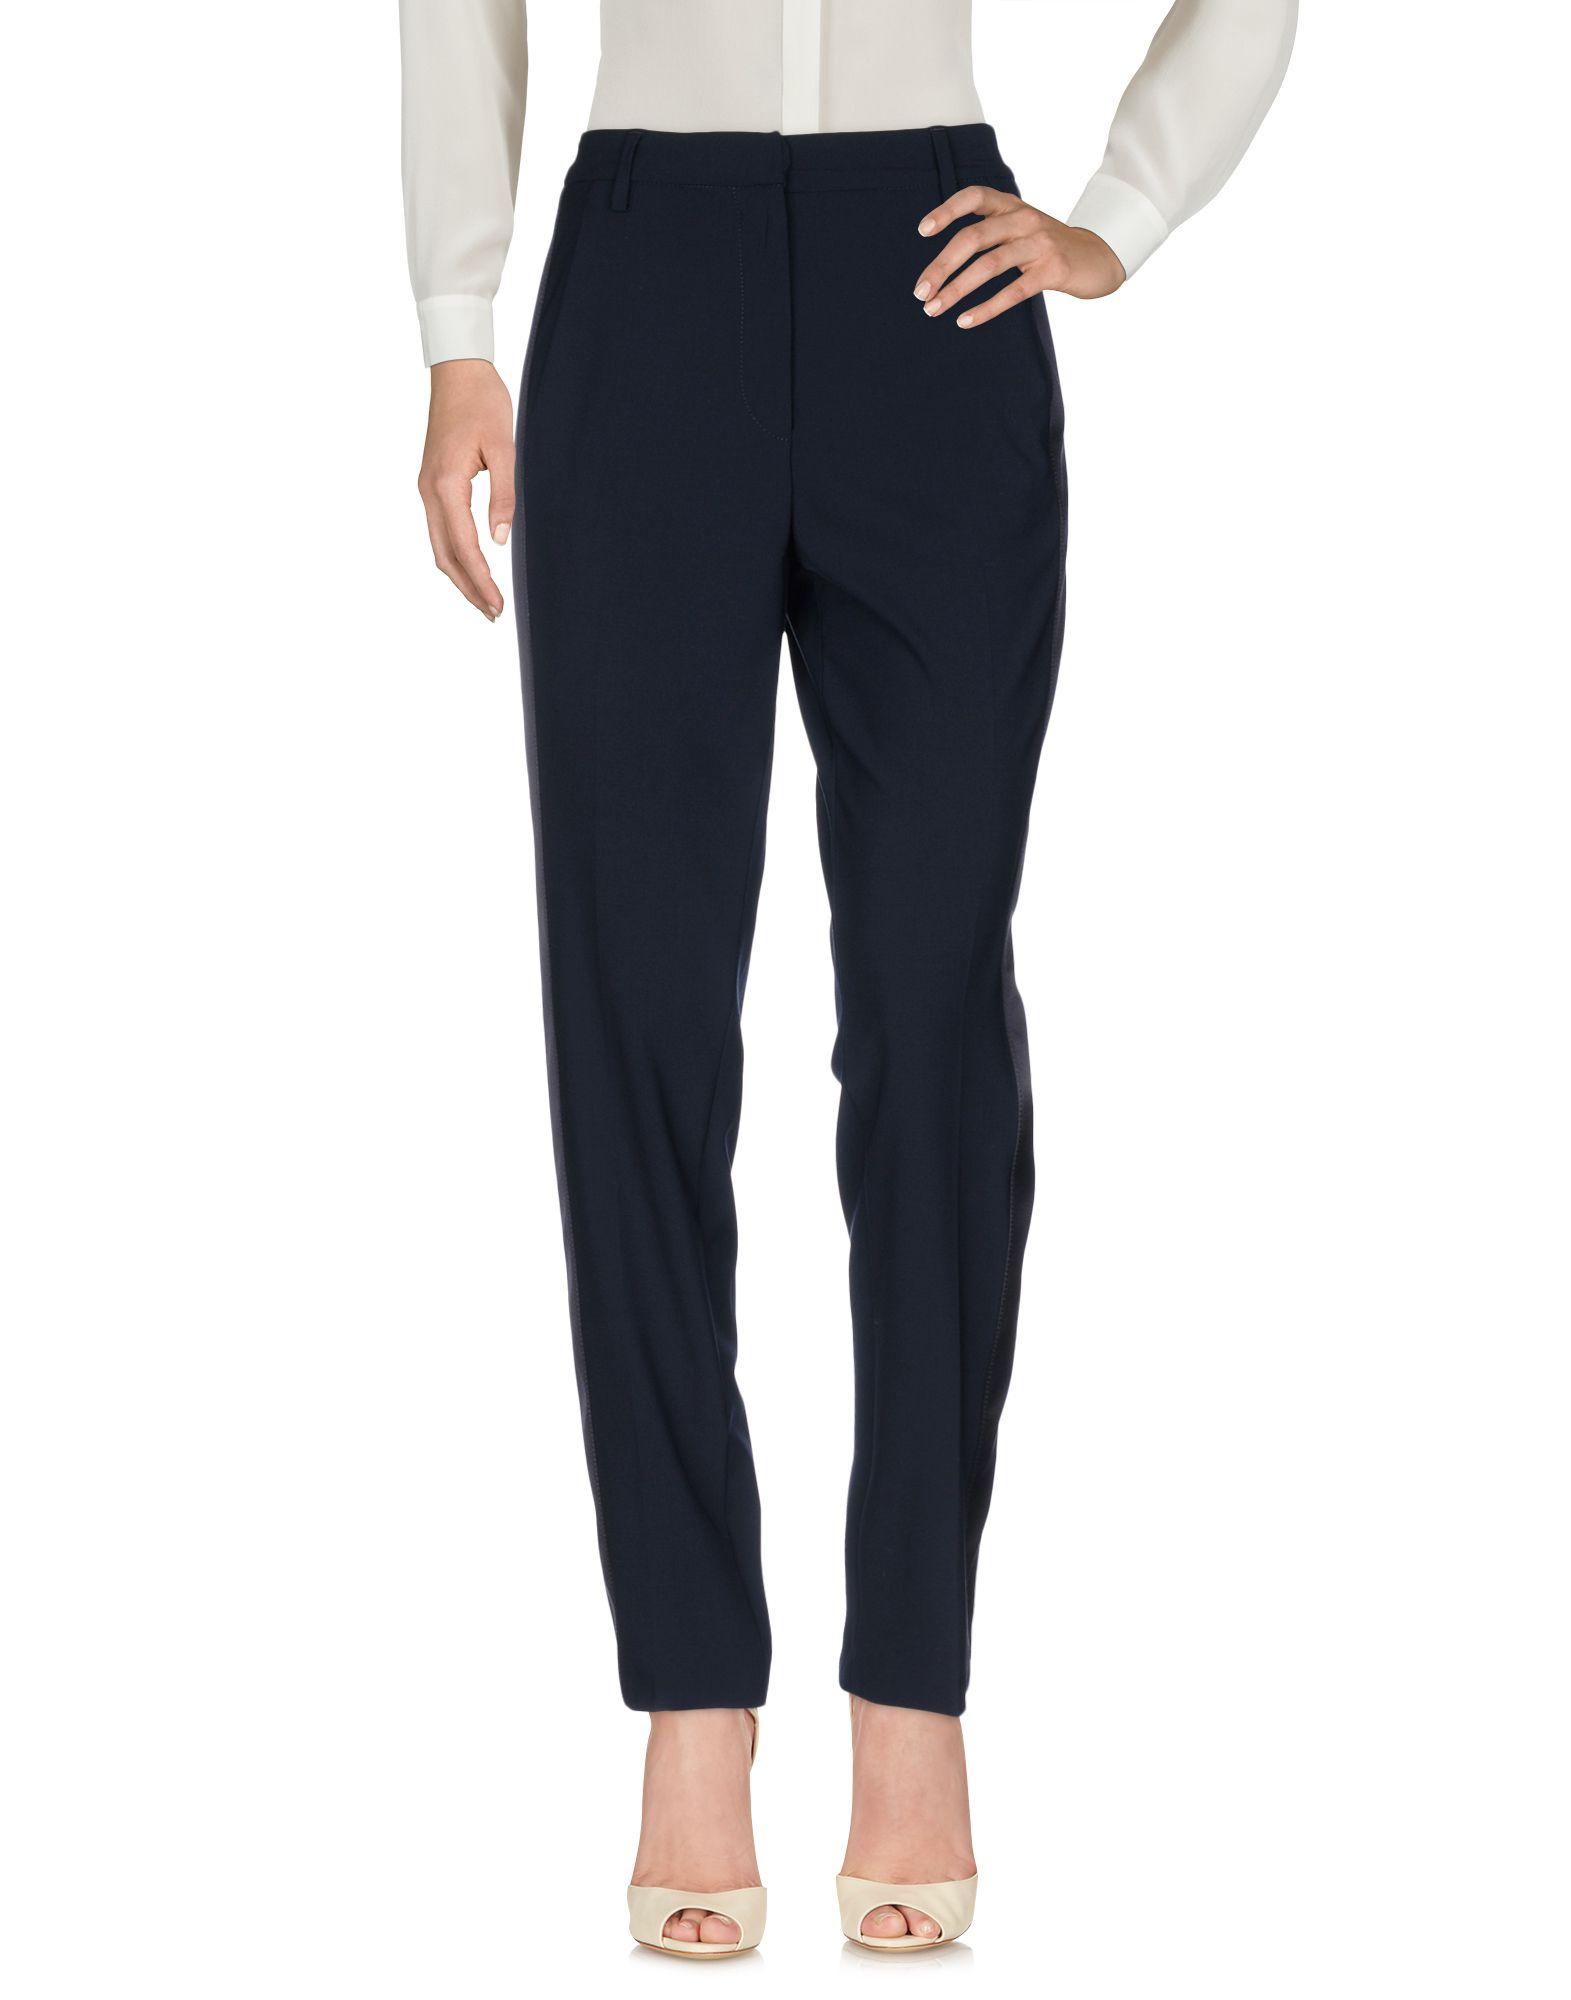 Pantalone Dondup Donna - Acquista online su 5NmpIX